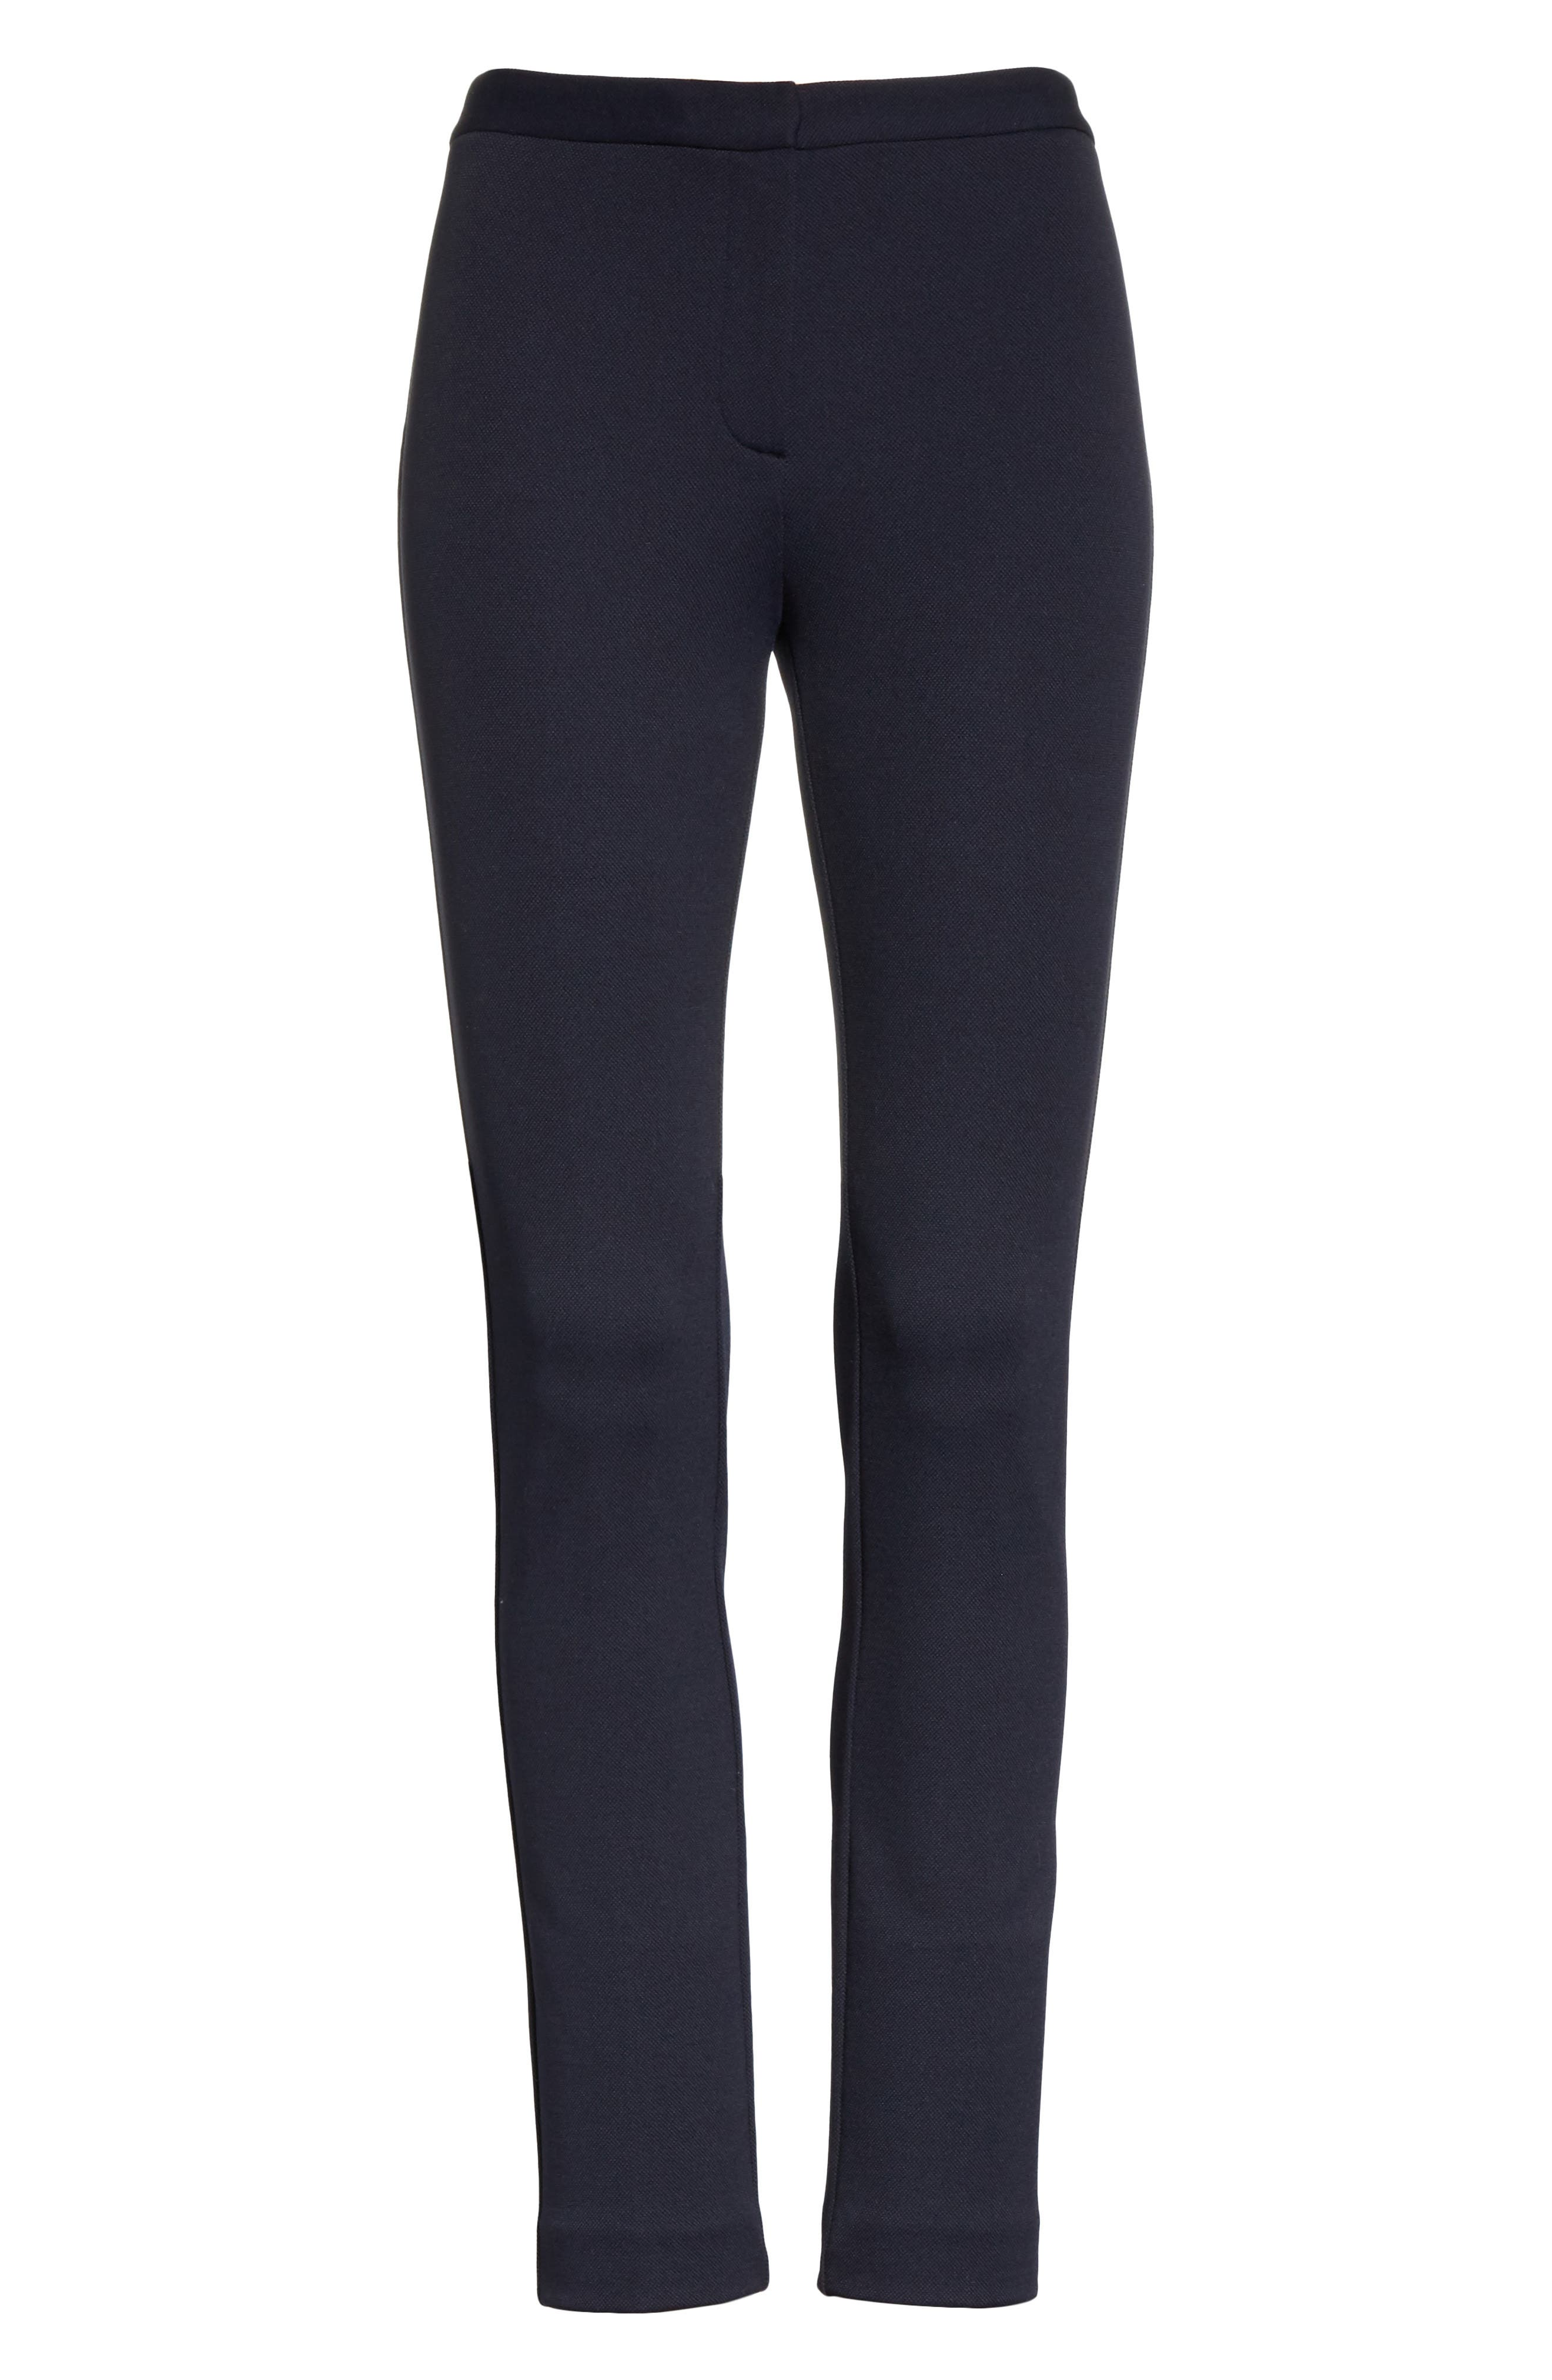 Piqué Skinny Pants,                             Alternate thumbnail 6, color,                             Black